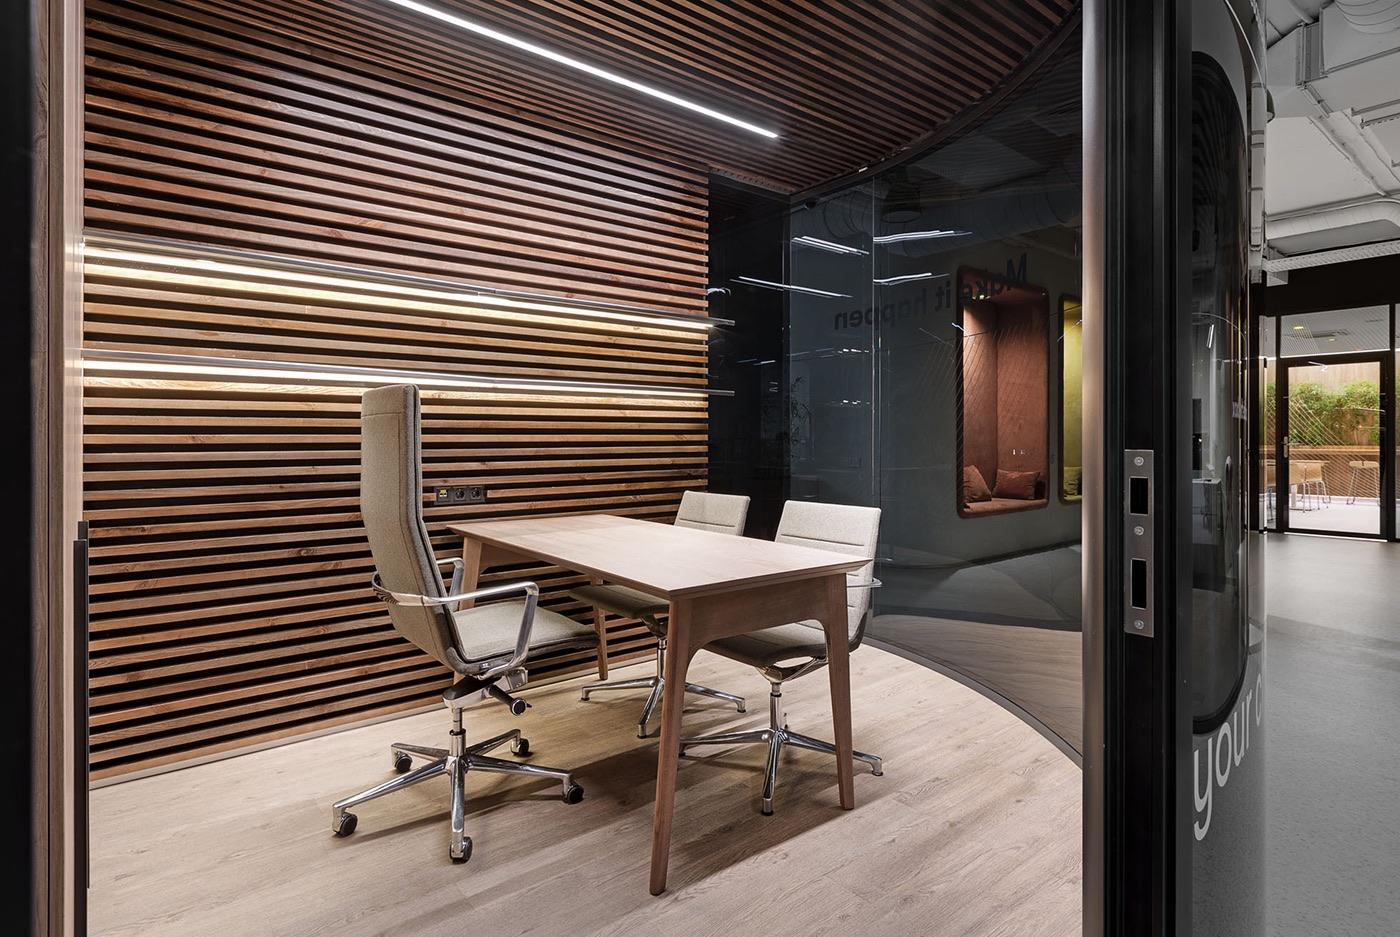 biosphere-corporation-office-8